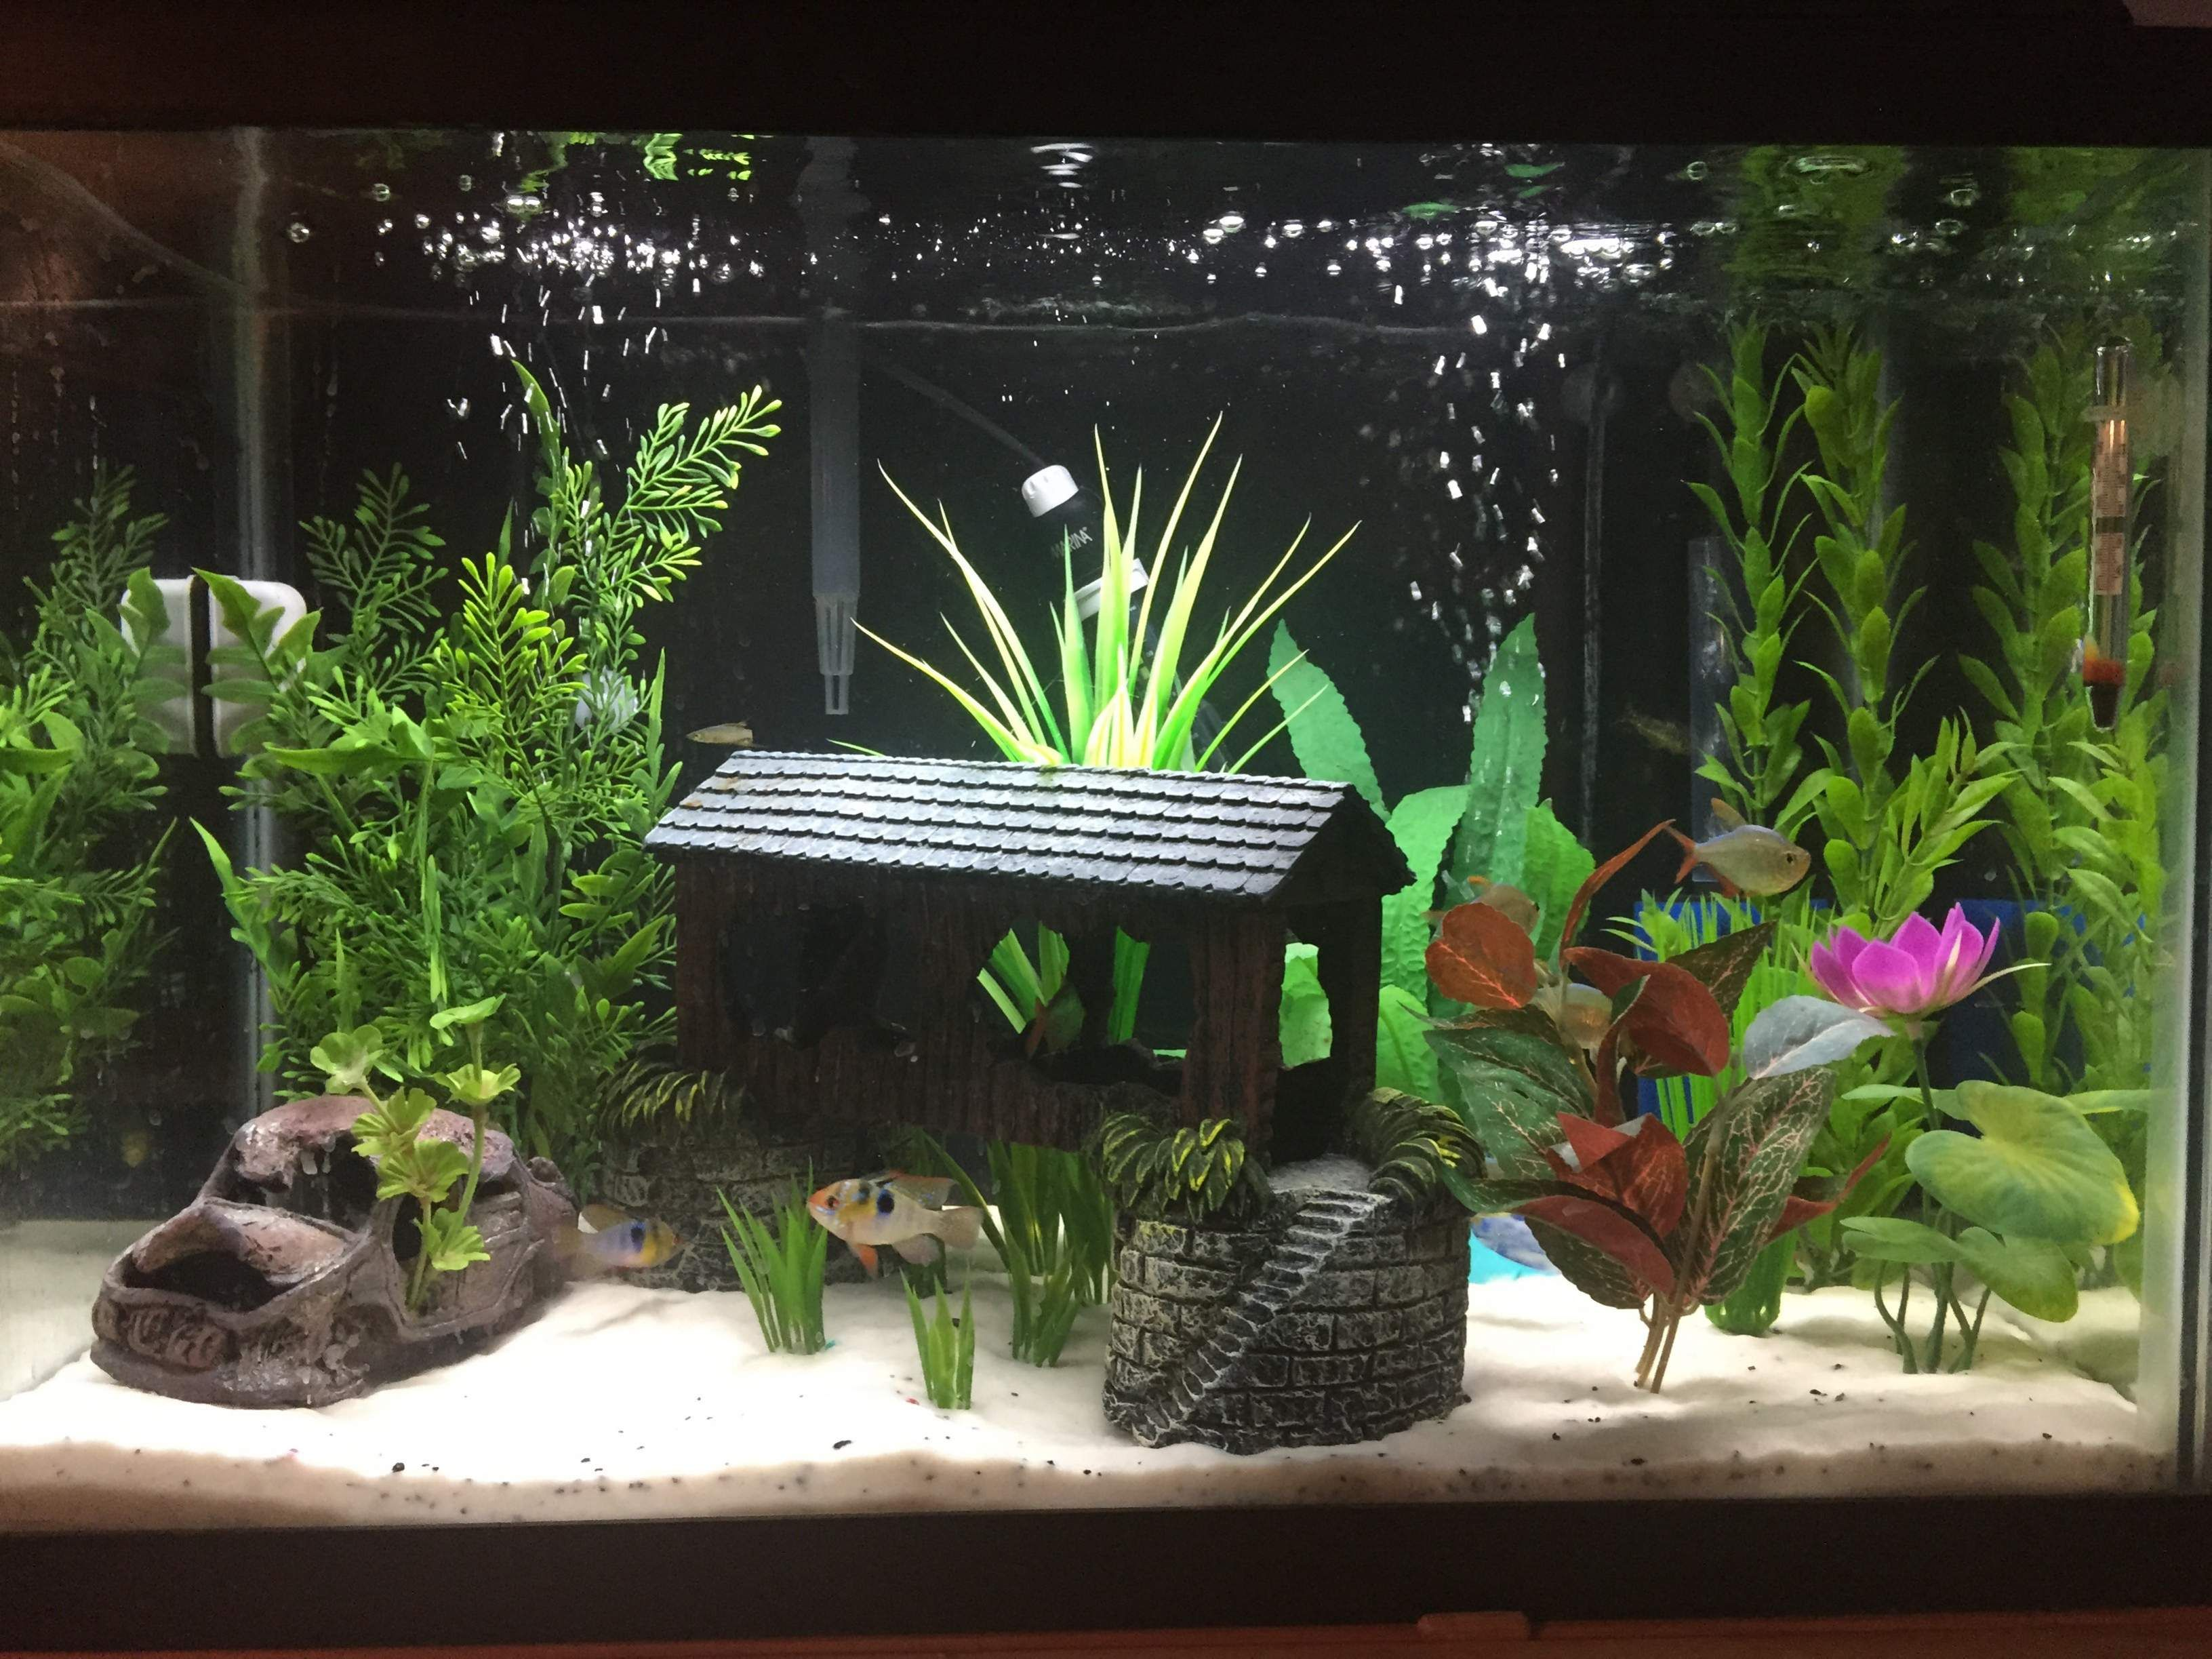 Well Planted 20 Gallon Aquariums Google Search Cool Fish Tanks Fish Tank Decorations Aquarium Fish Tank